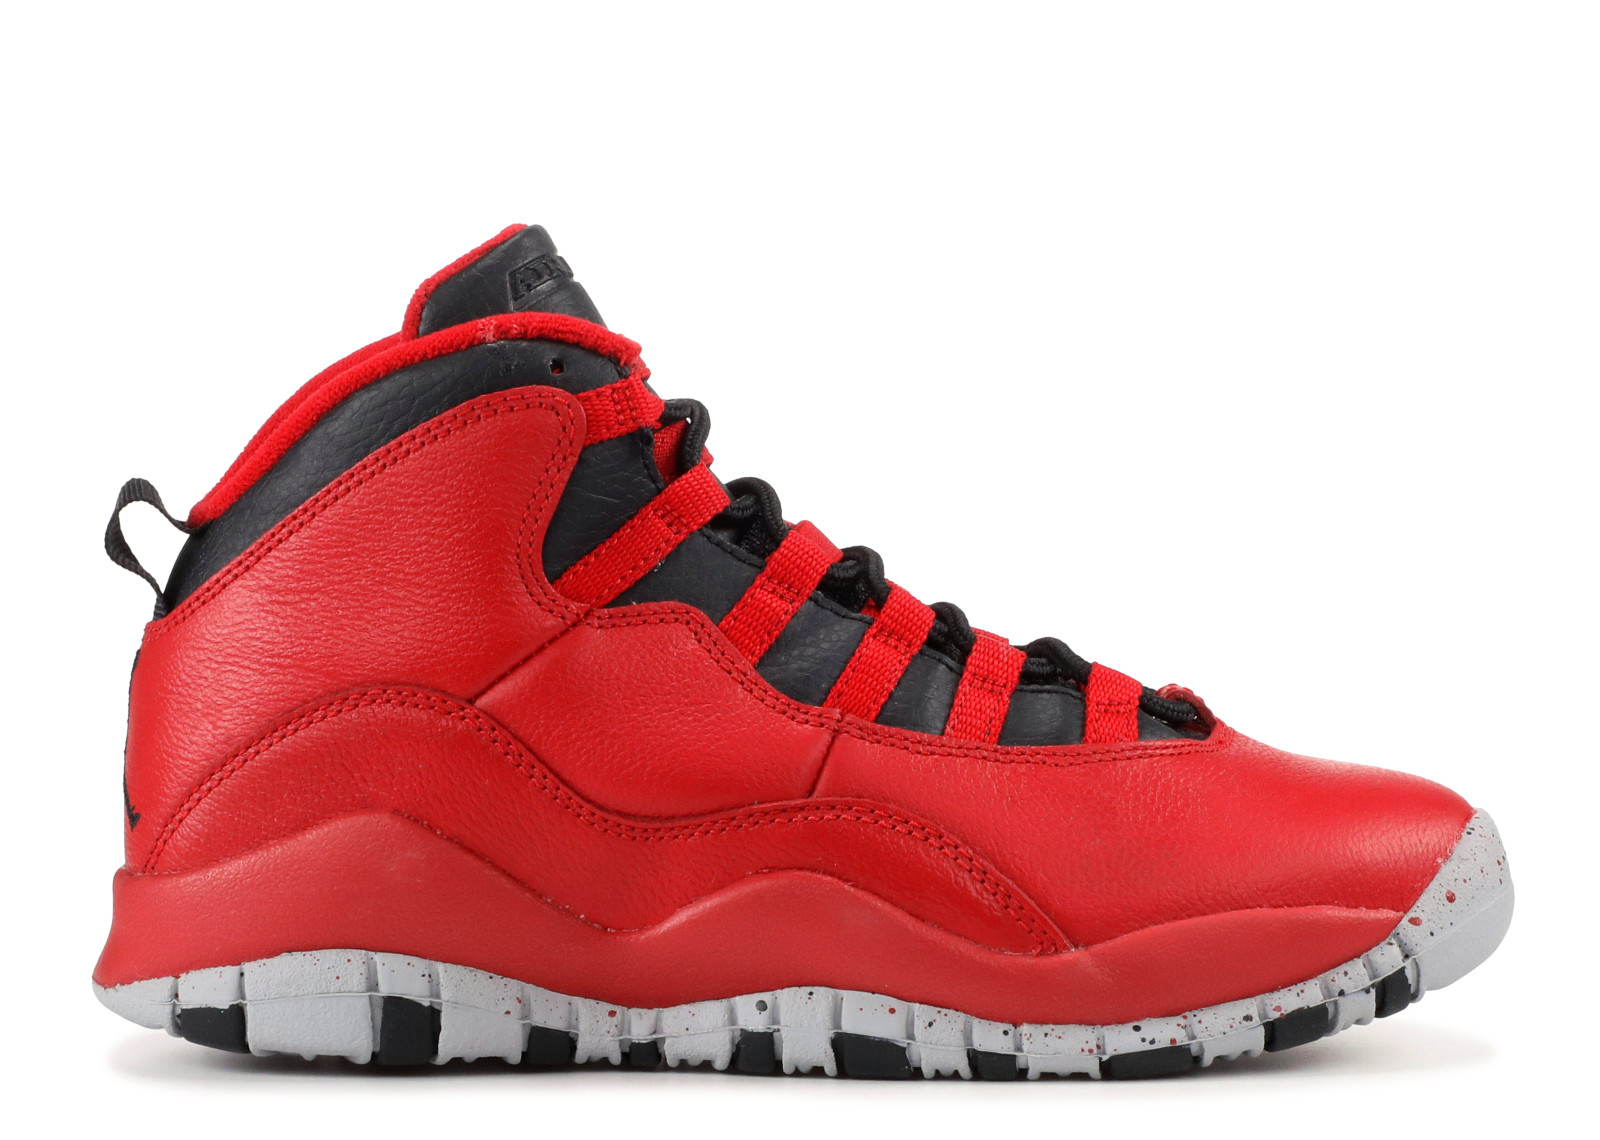 lowest price ad7f4 111ee Air Jordan - Unisex - Air Jordan 10 Retro 30Th Bg (Gs) 'Bulls Over  Broadway' - 705179-601 - Size 4